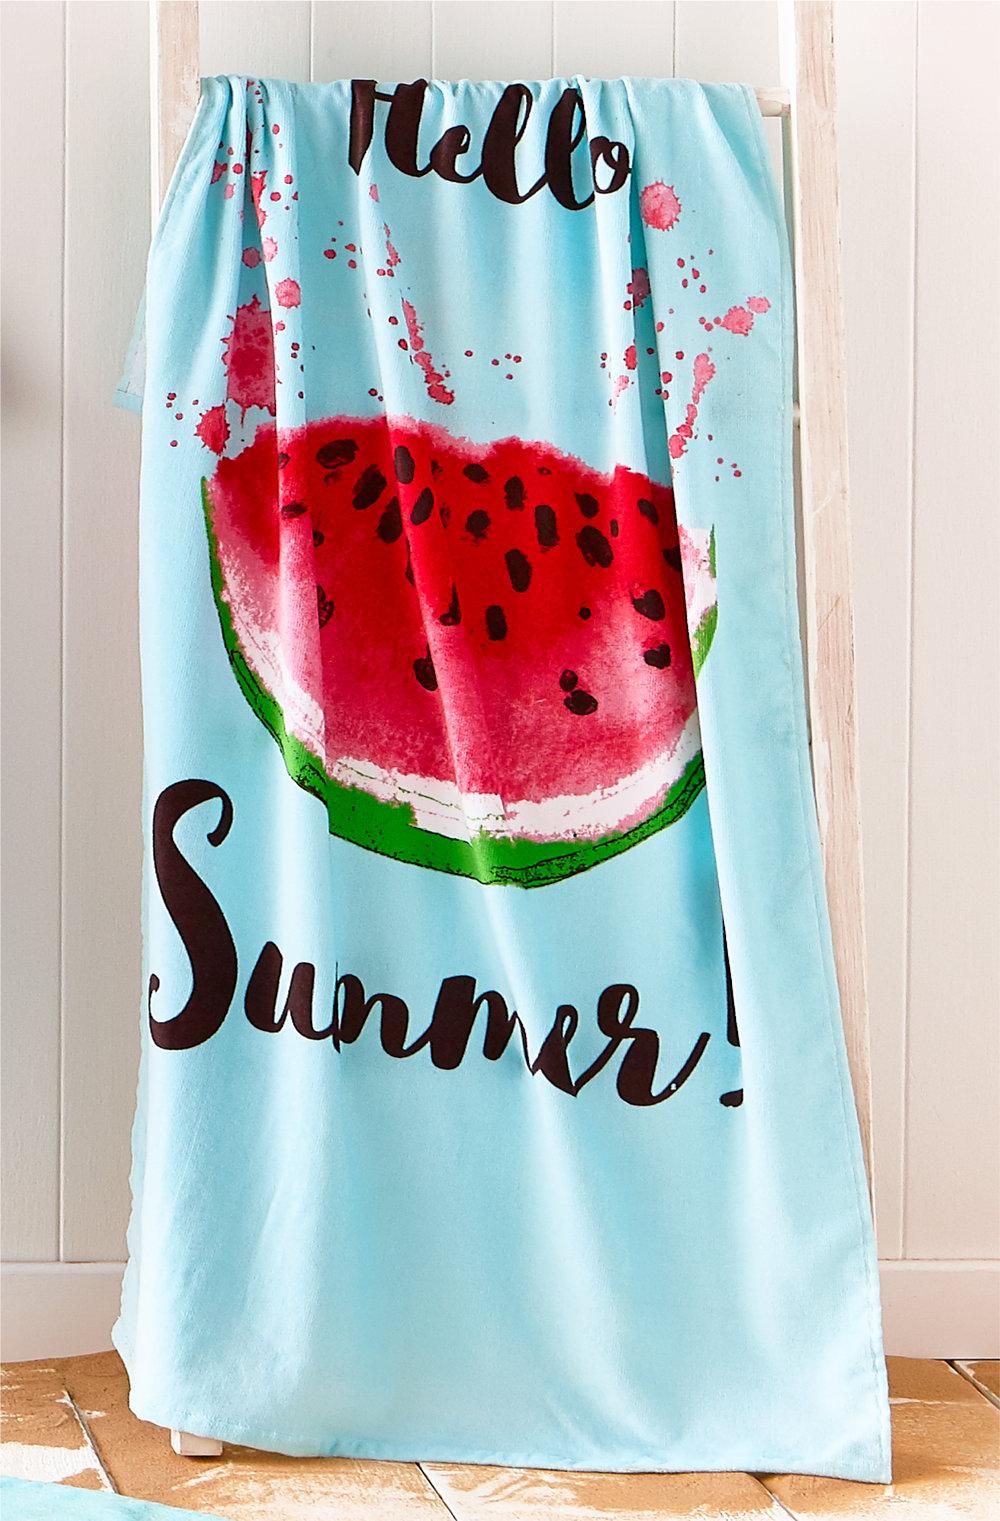 Watermelon_IMAGE-2.jpg